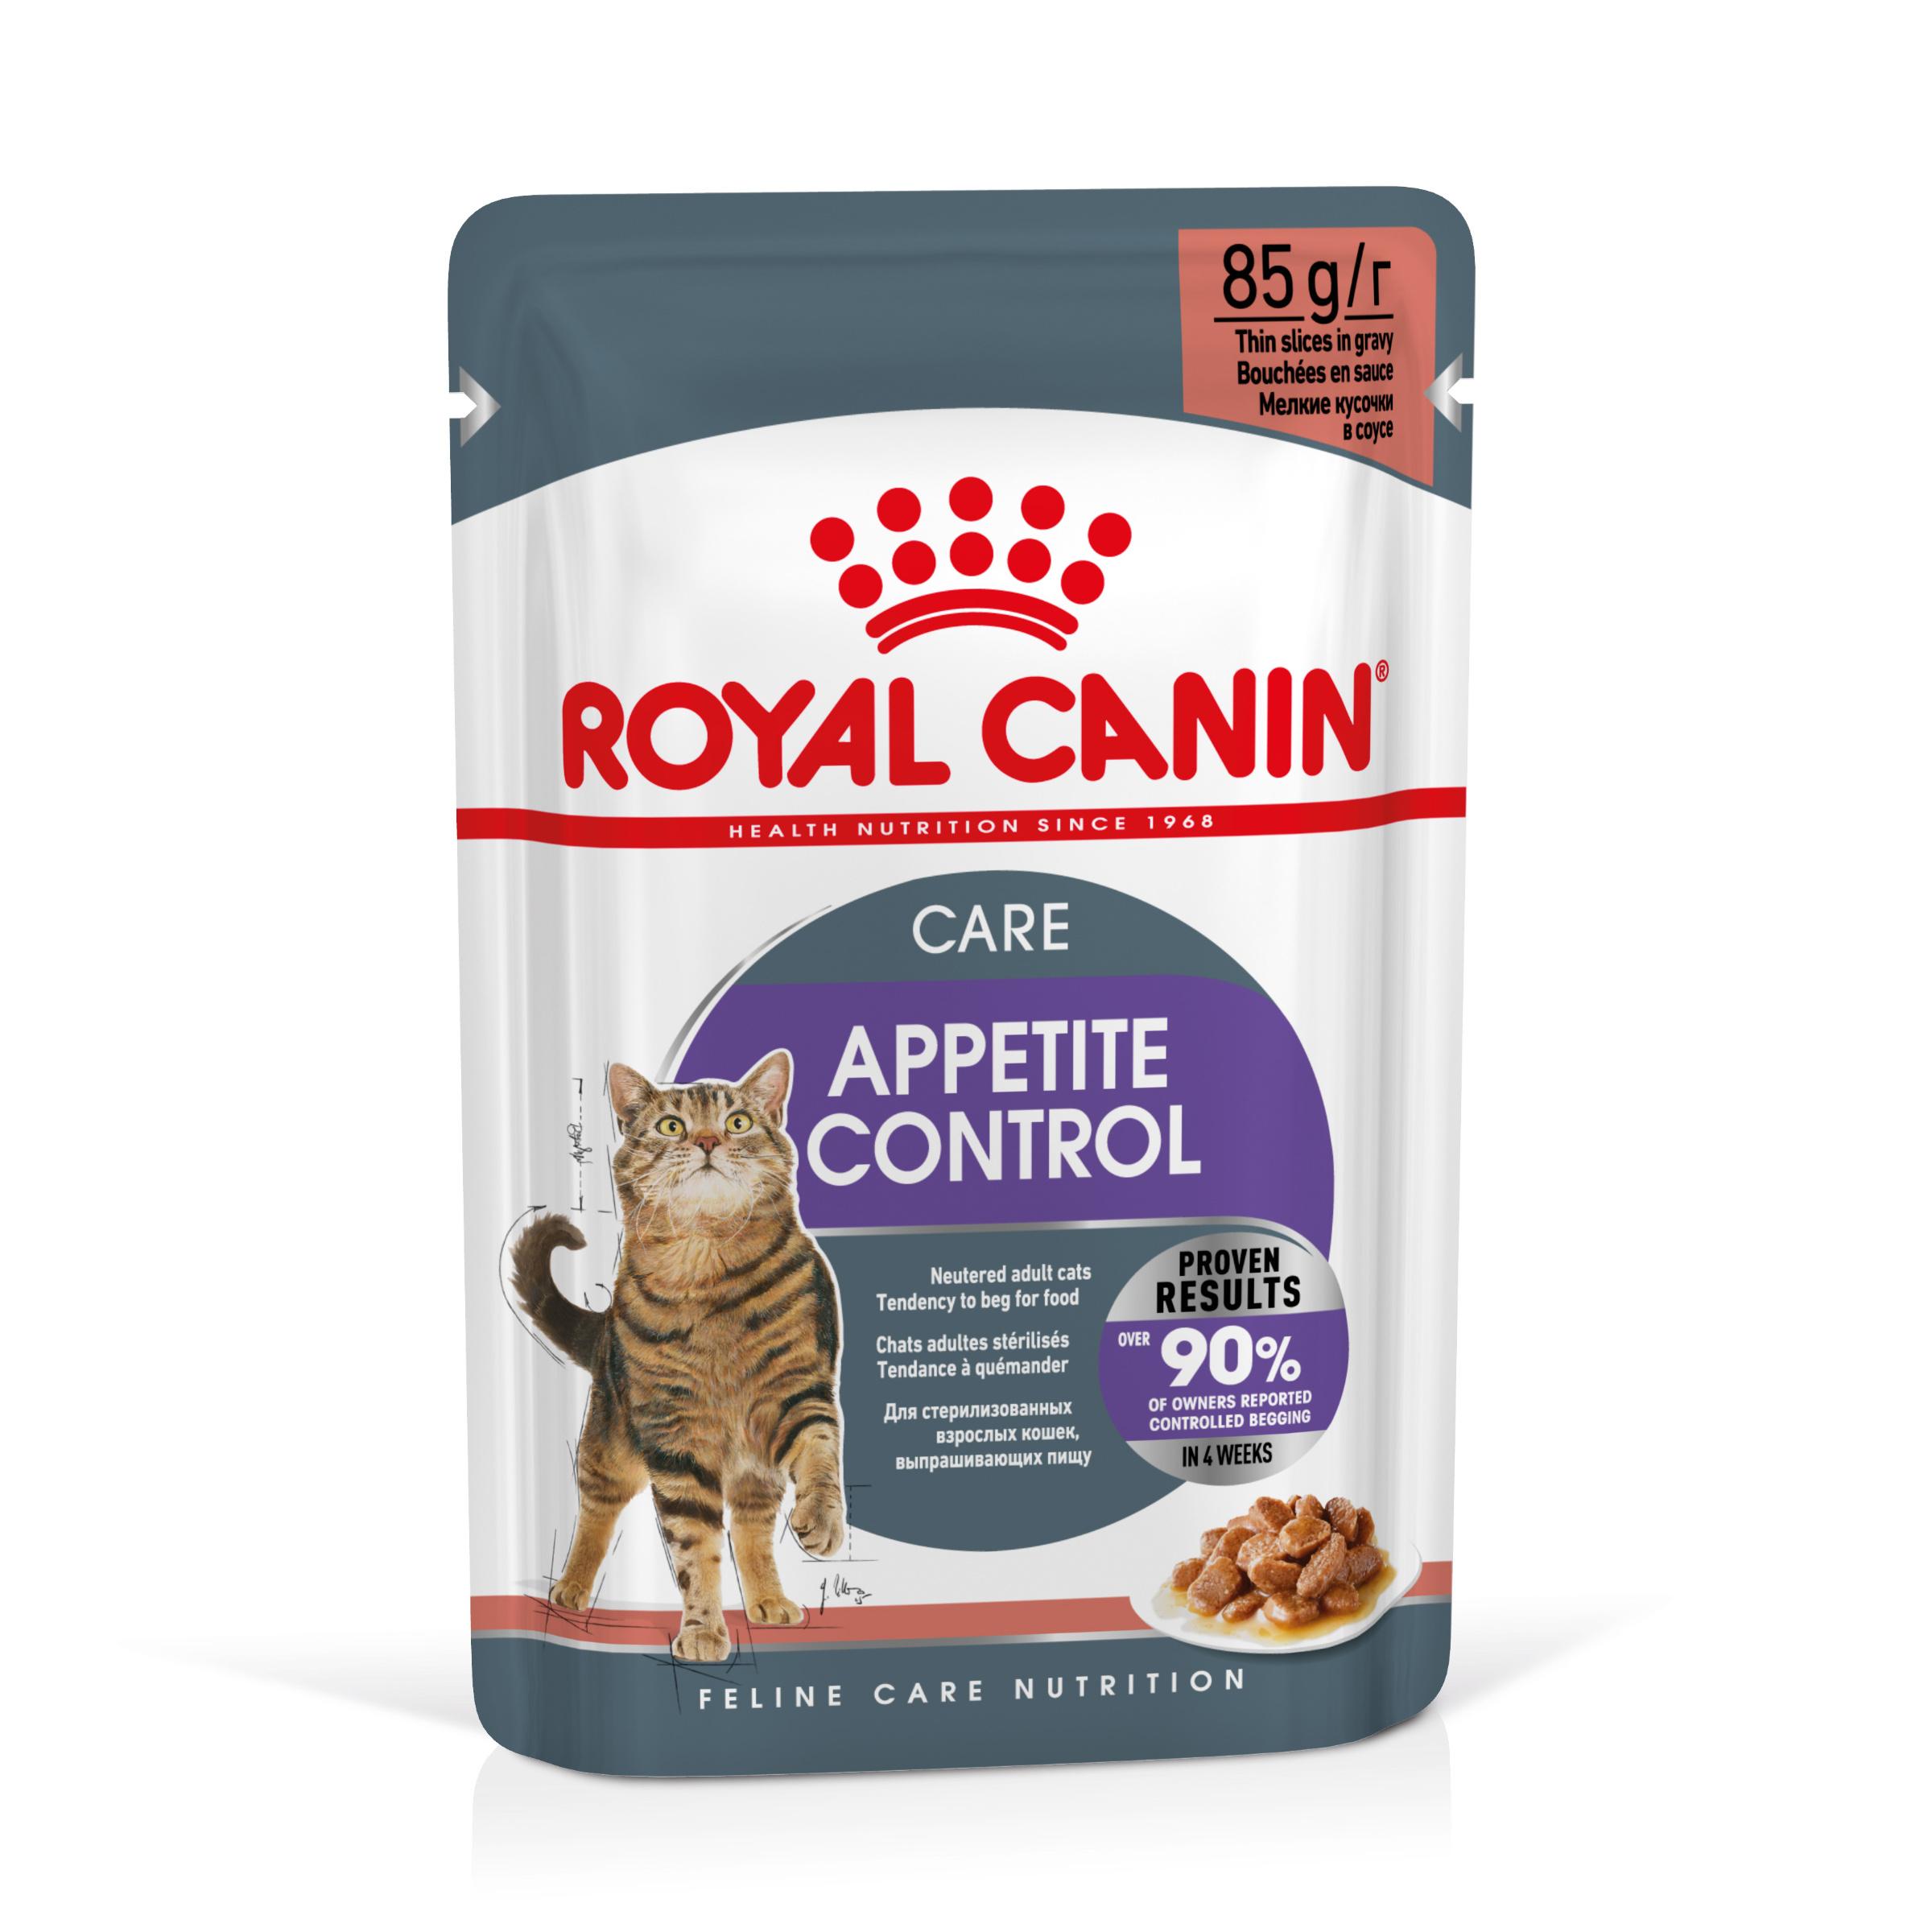 Appetite Control Gravy